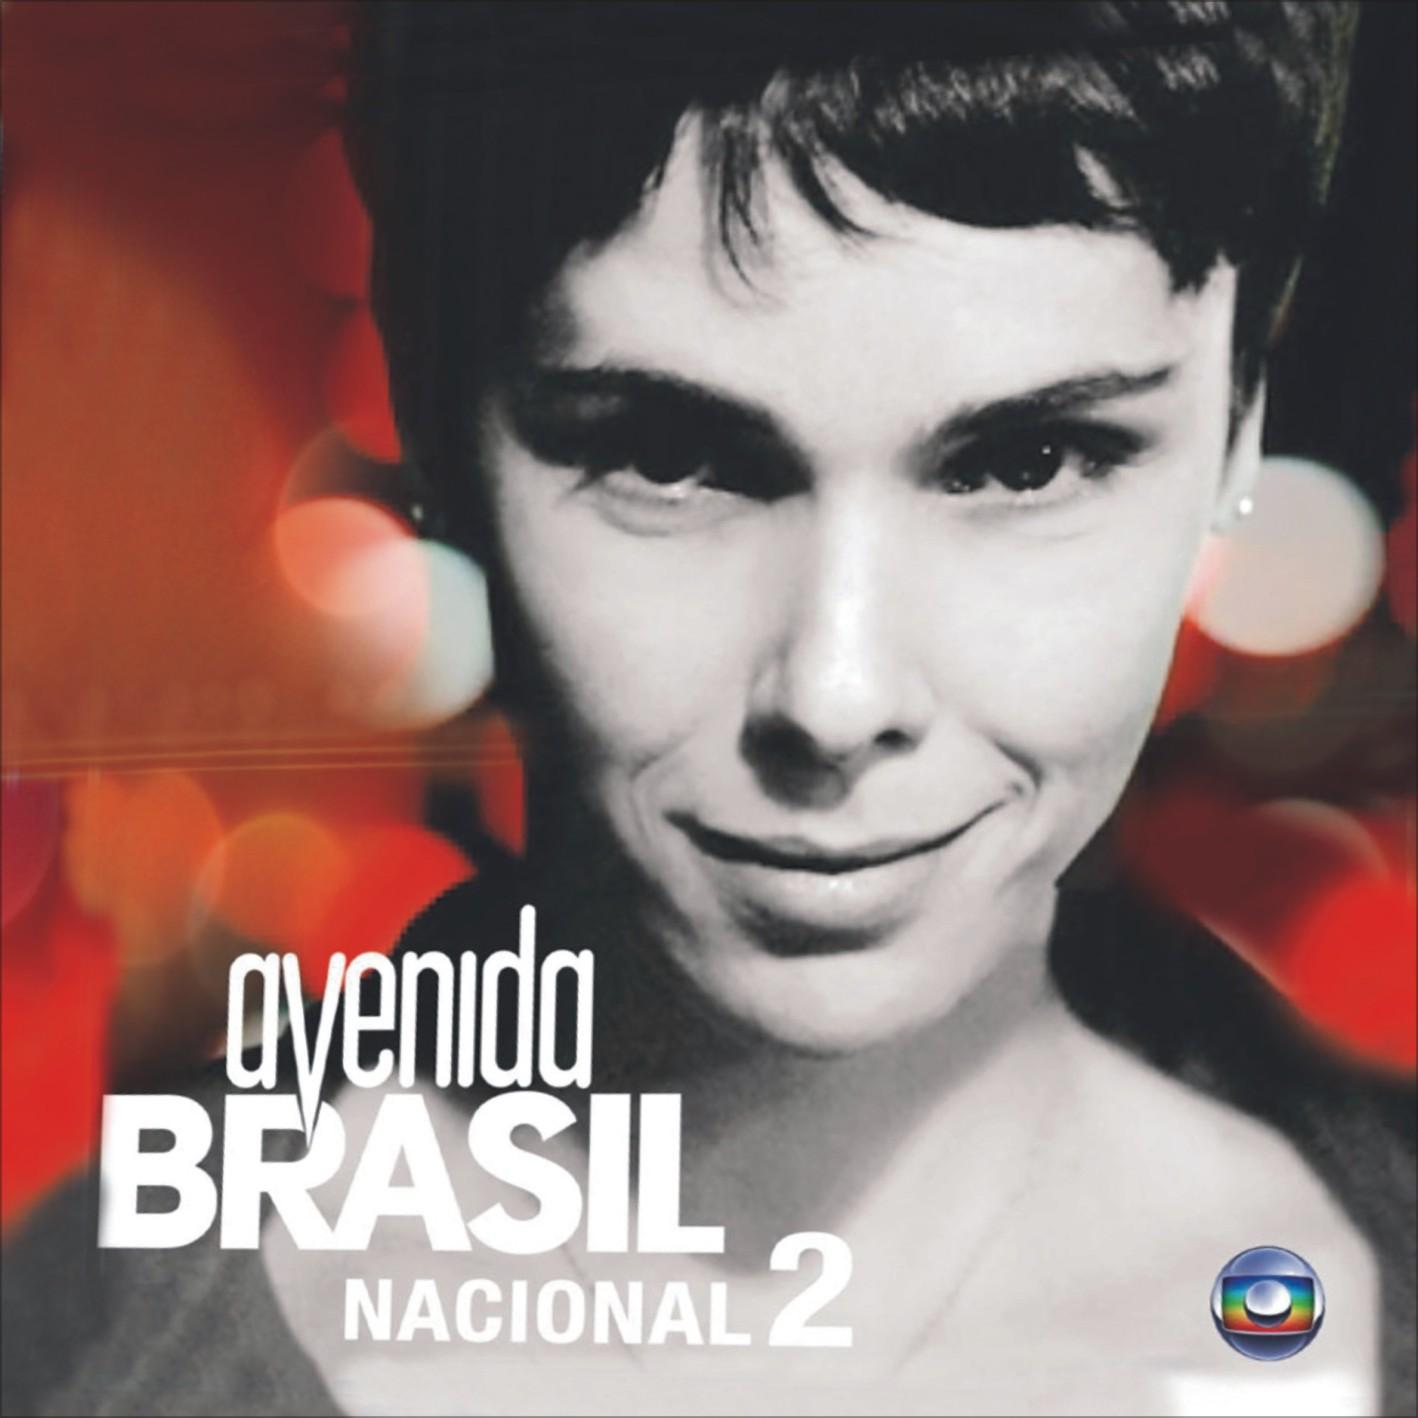 Avenida+Brasil+Nacional+2+Frente.jpg